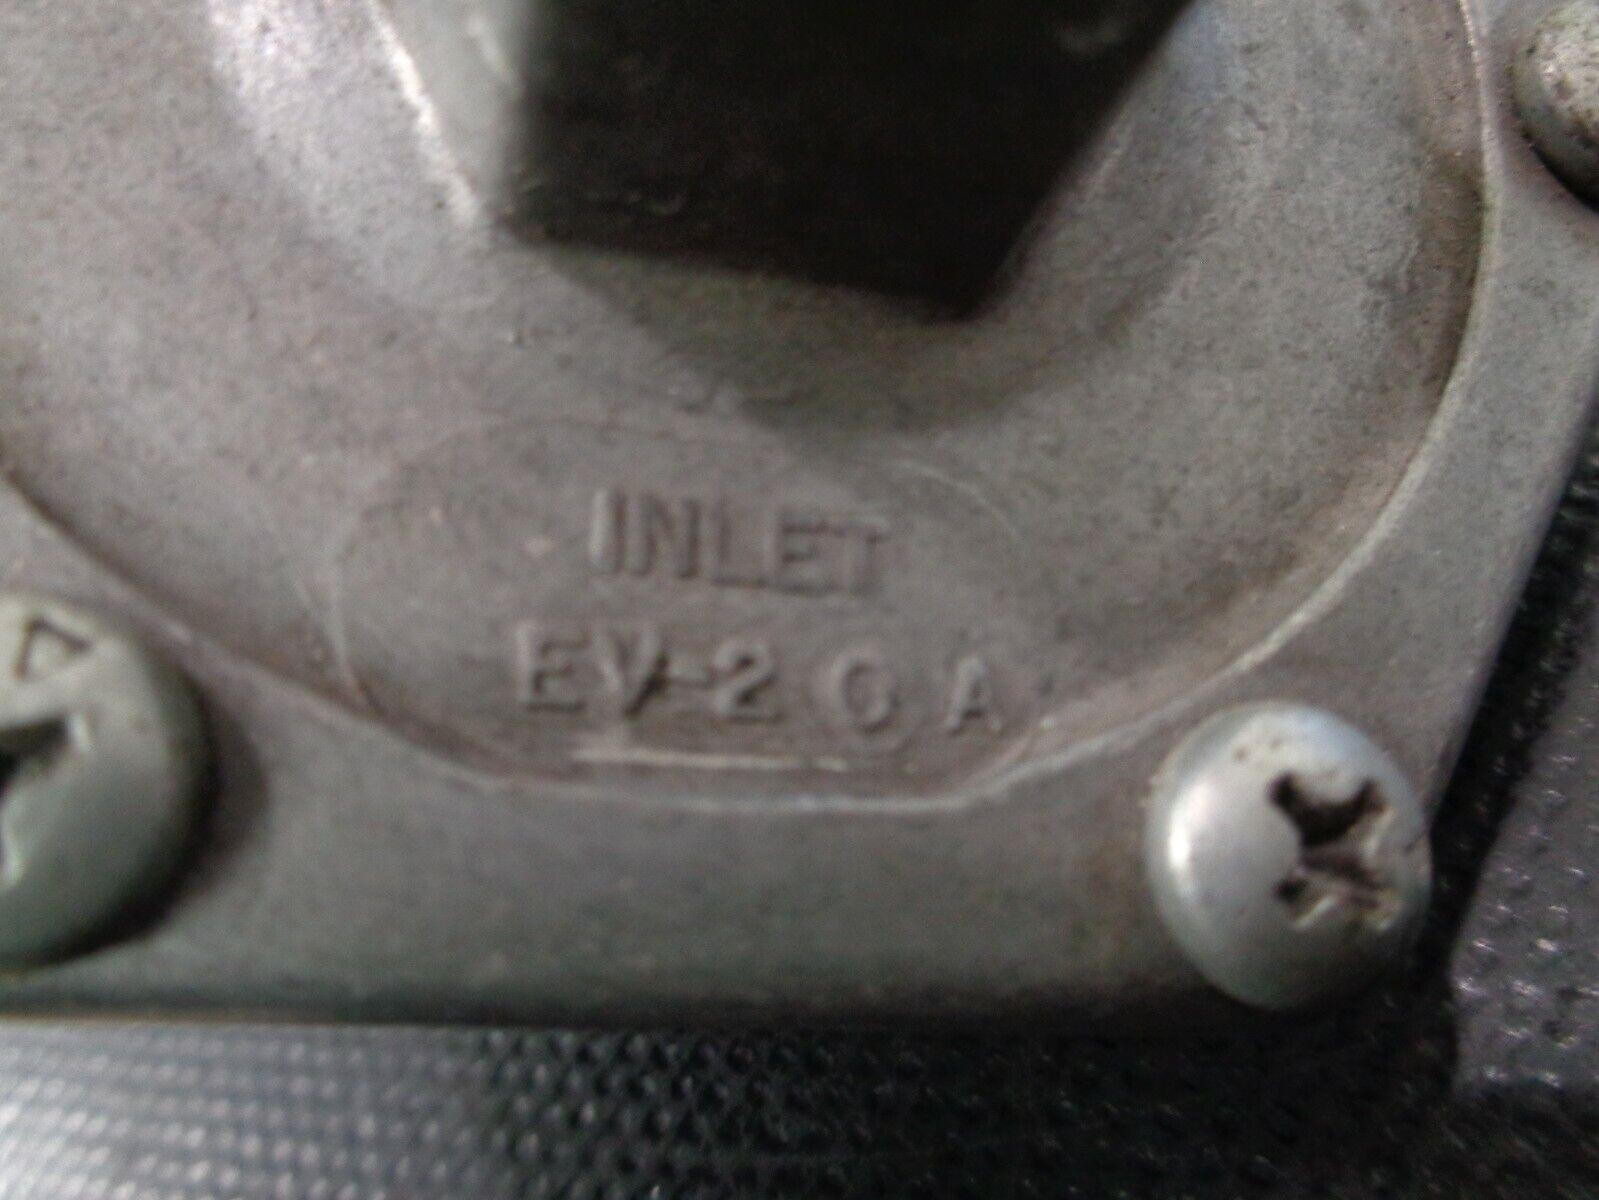 DELTROL EV-2 0 A VALVE